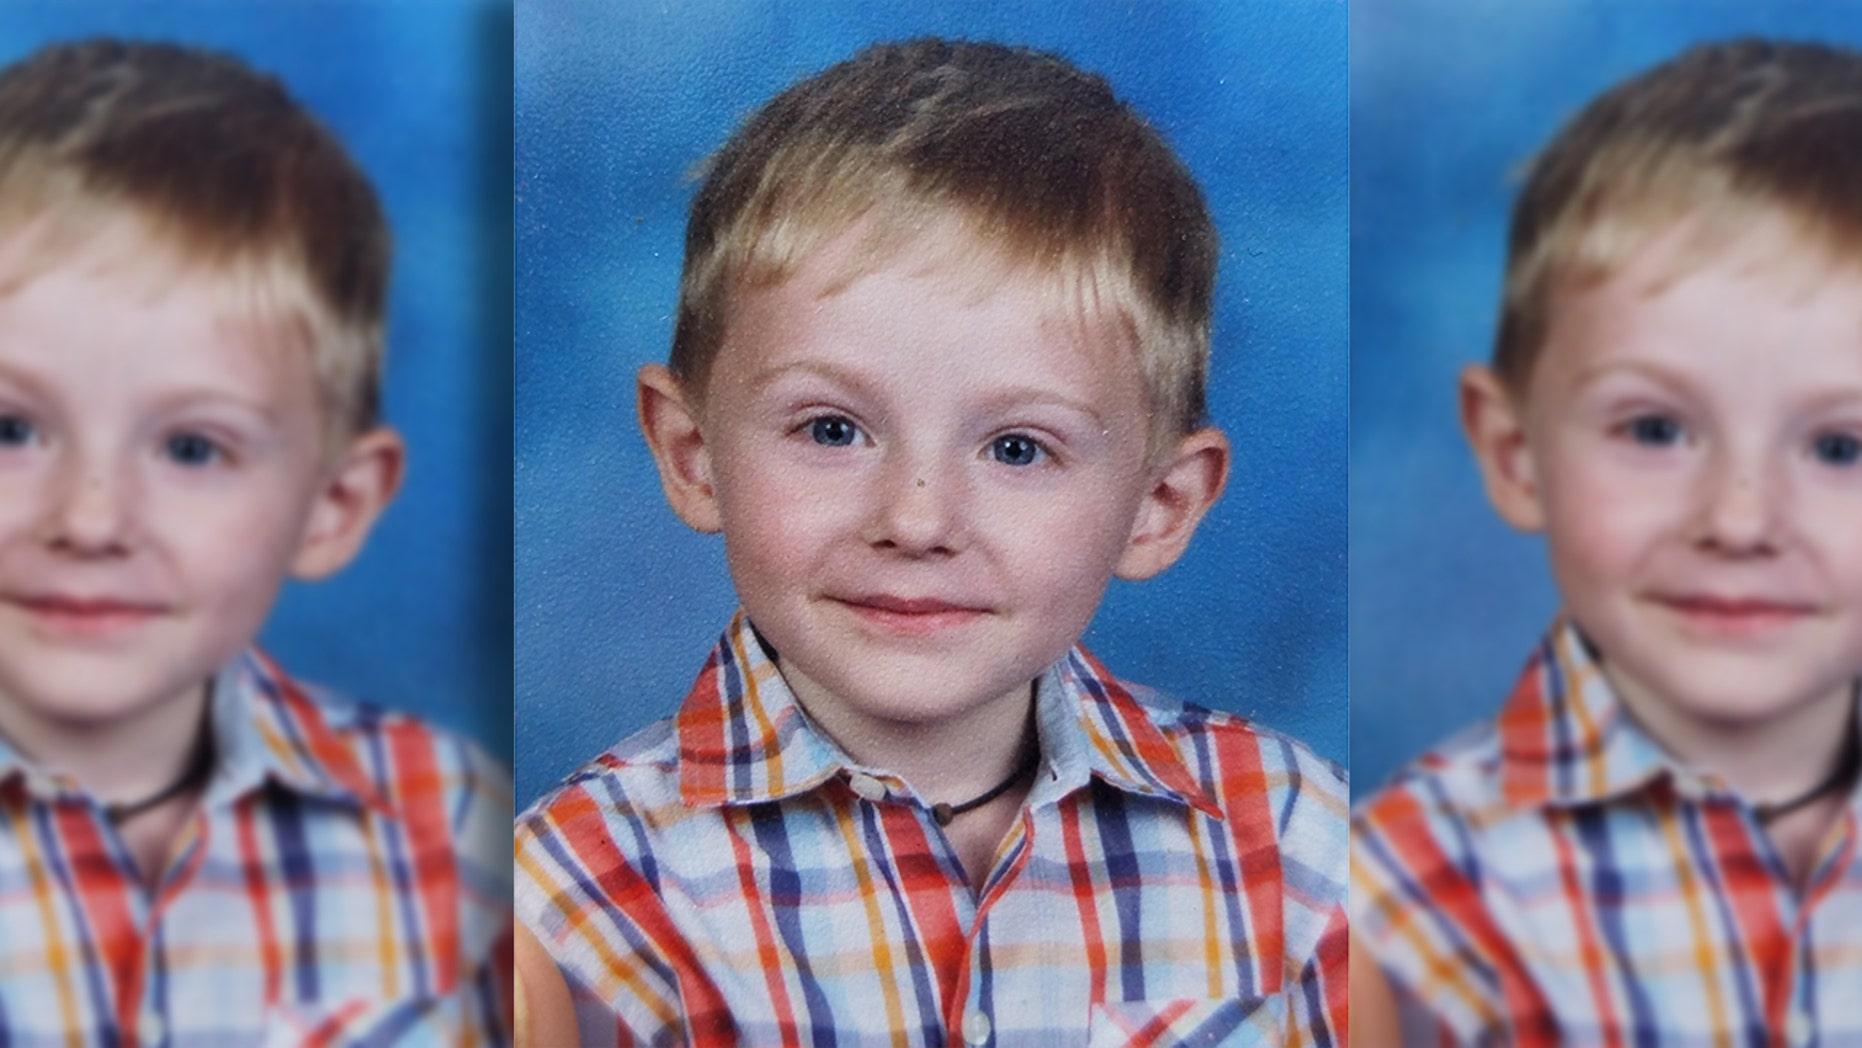 Maddox Ritch, 6, was last seen at Rankin Lake Park at 1:30 p.m on Saturday.